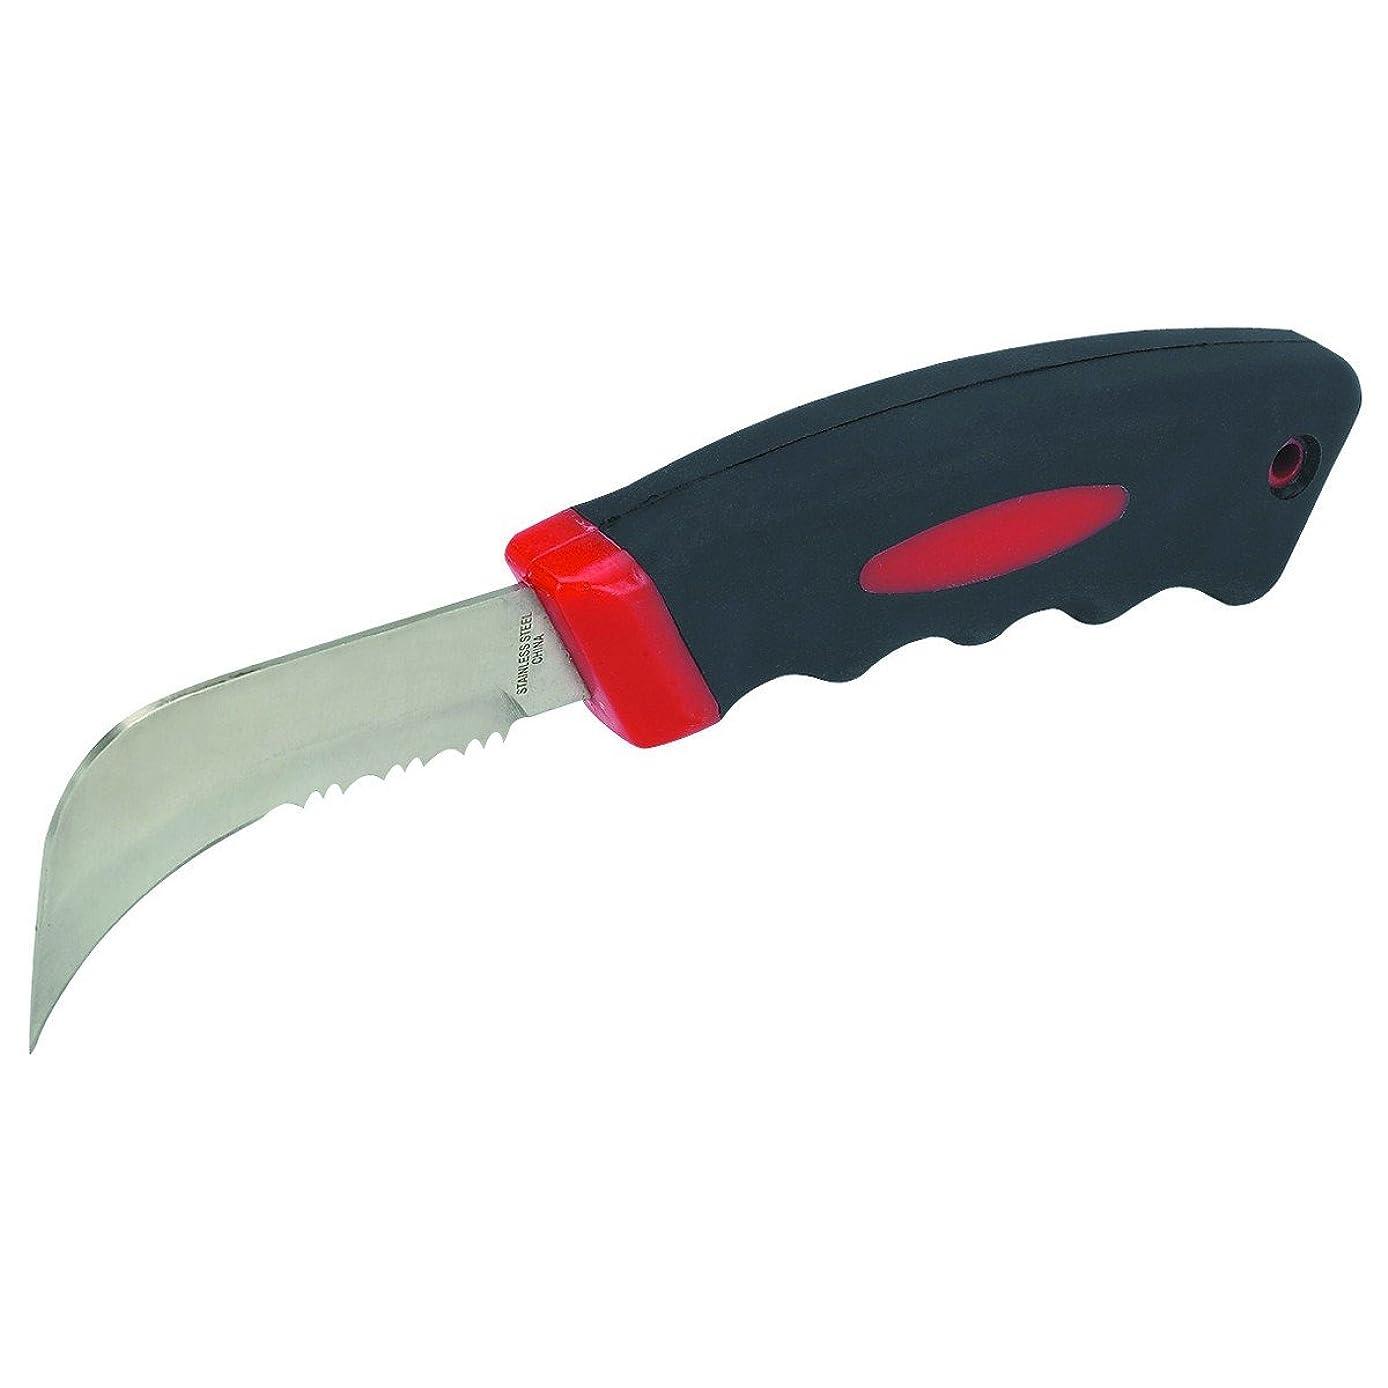 King 8-Inch Linoleum Knife